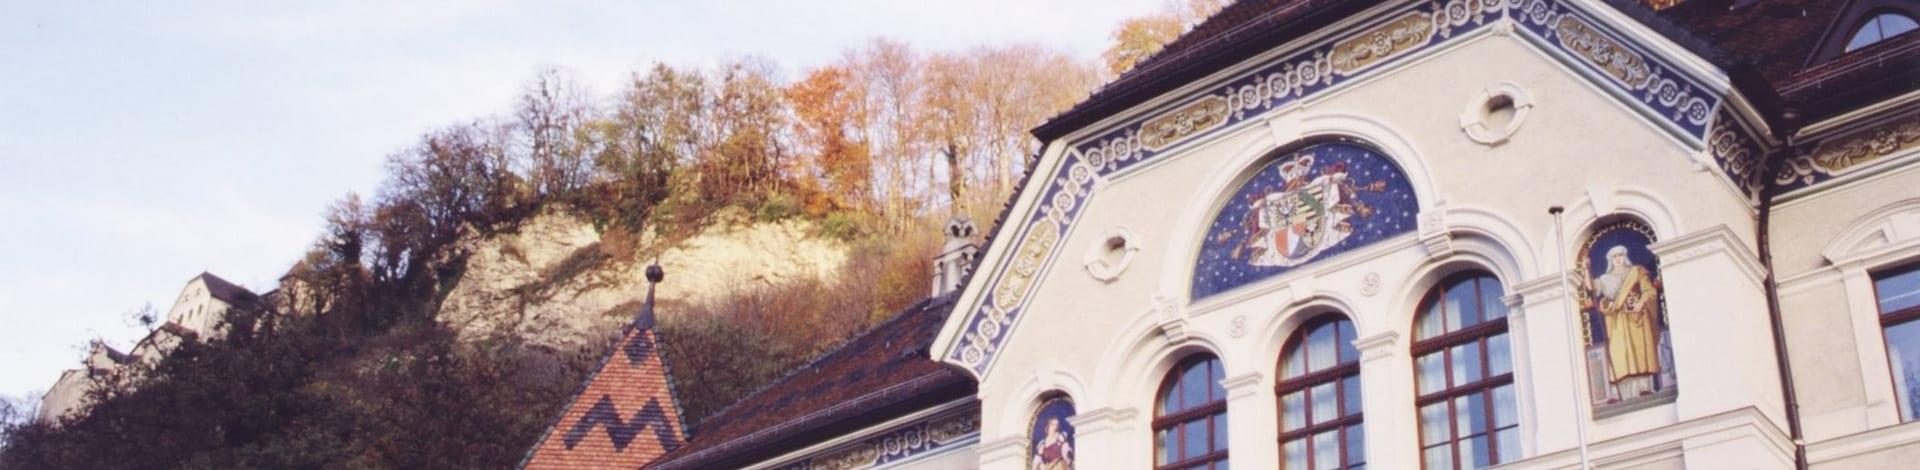 la Principauté de Liechtenstein